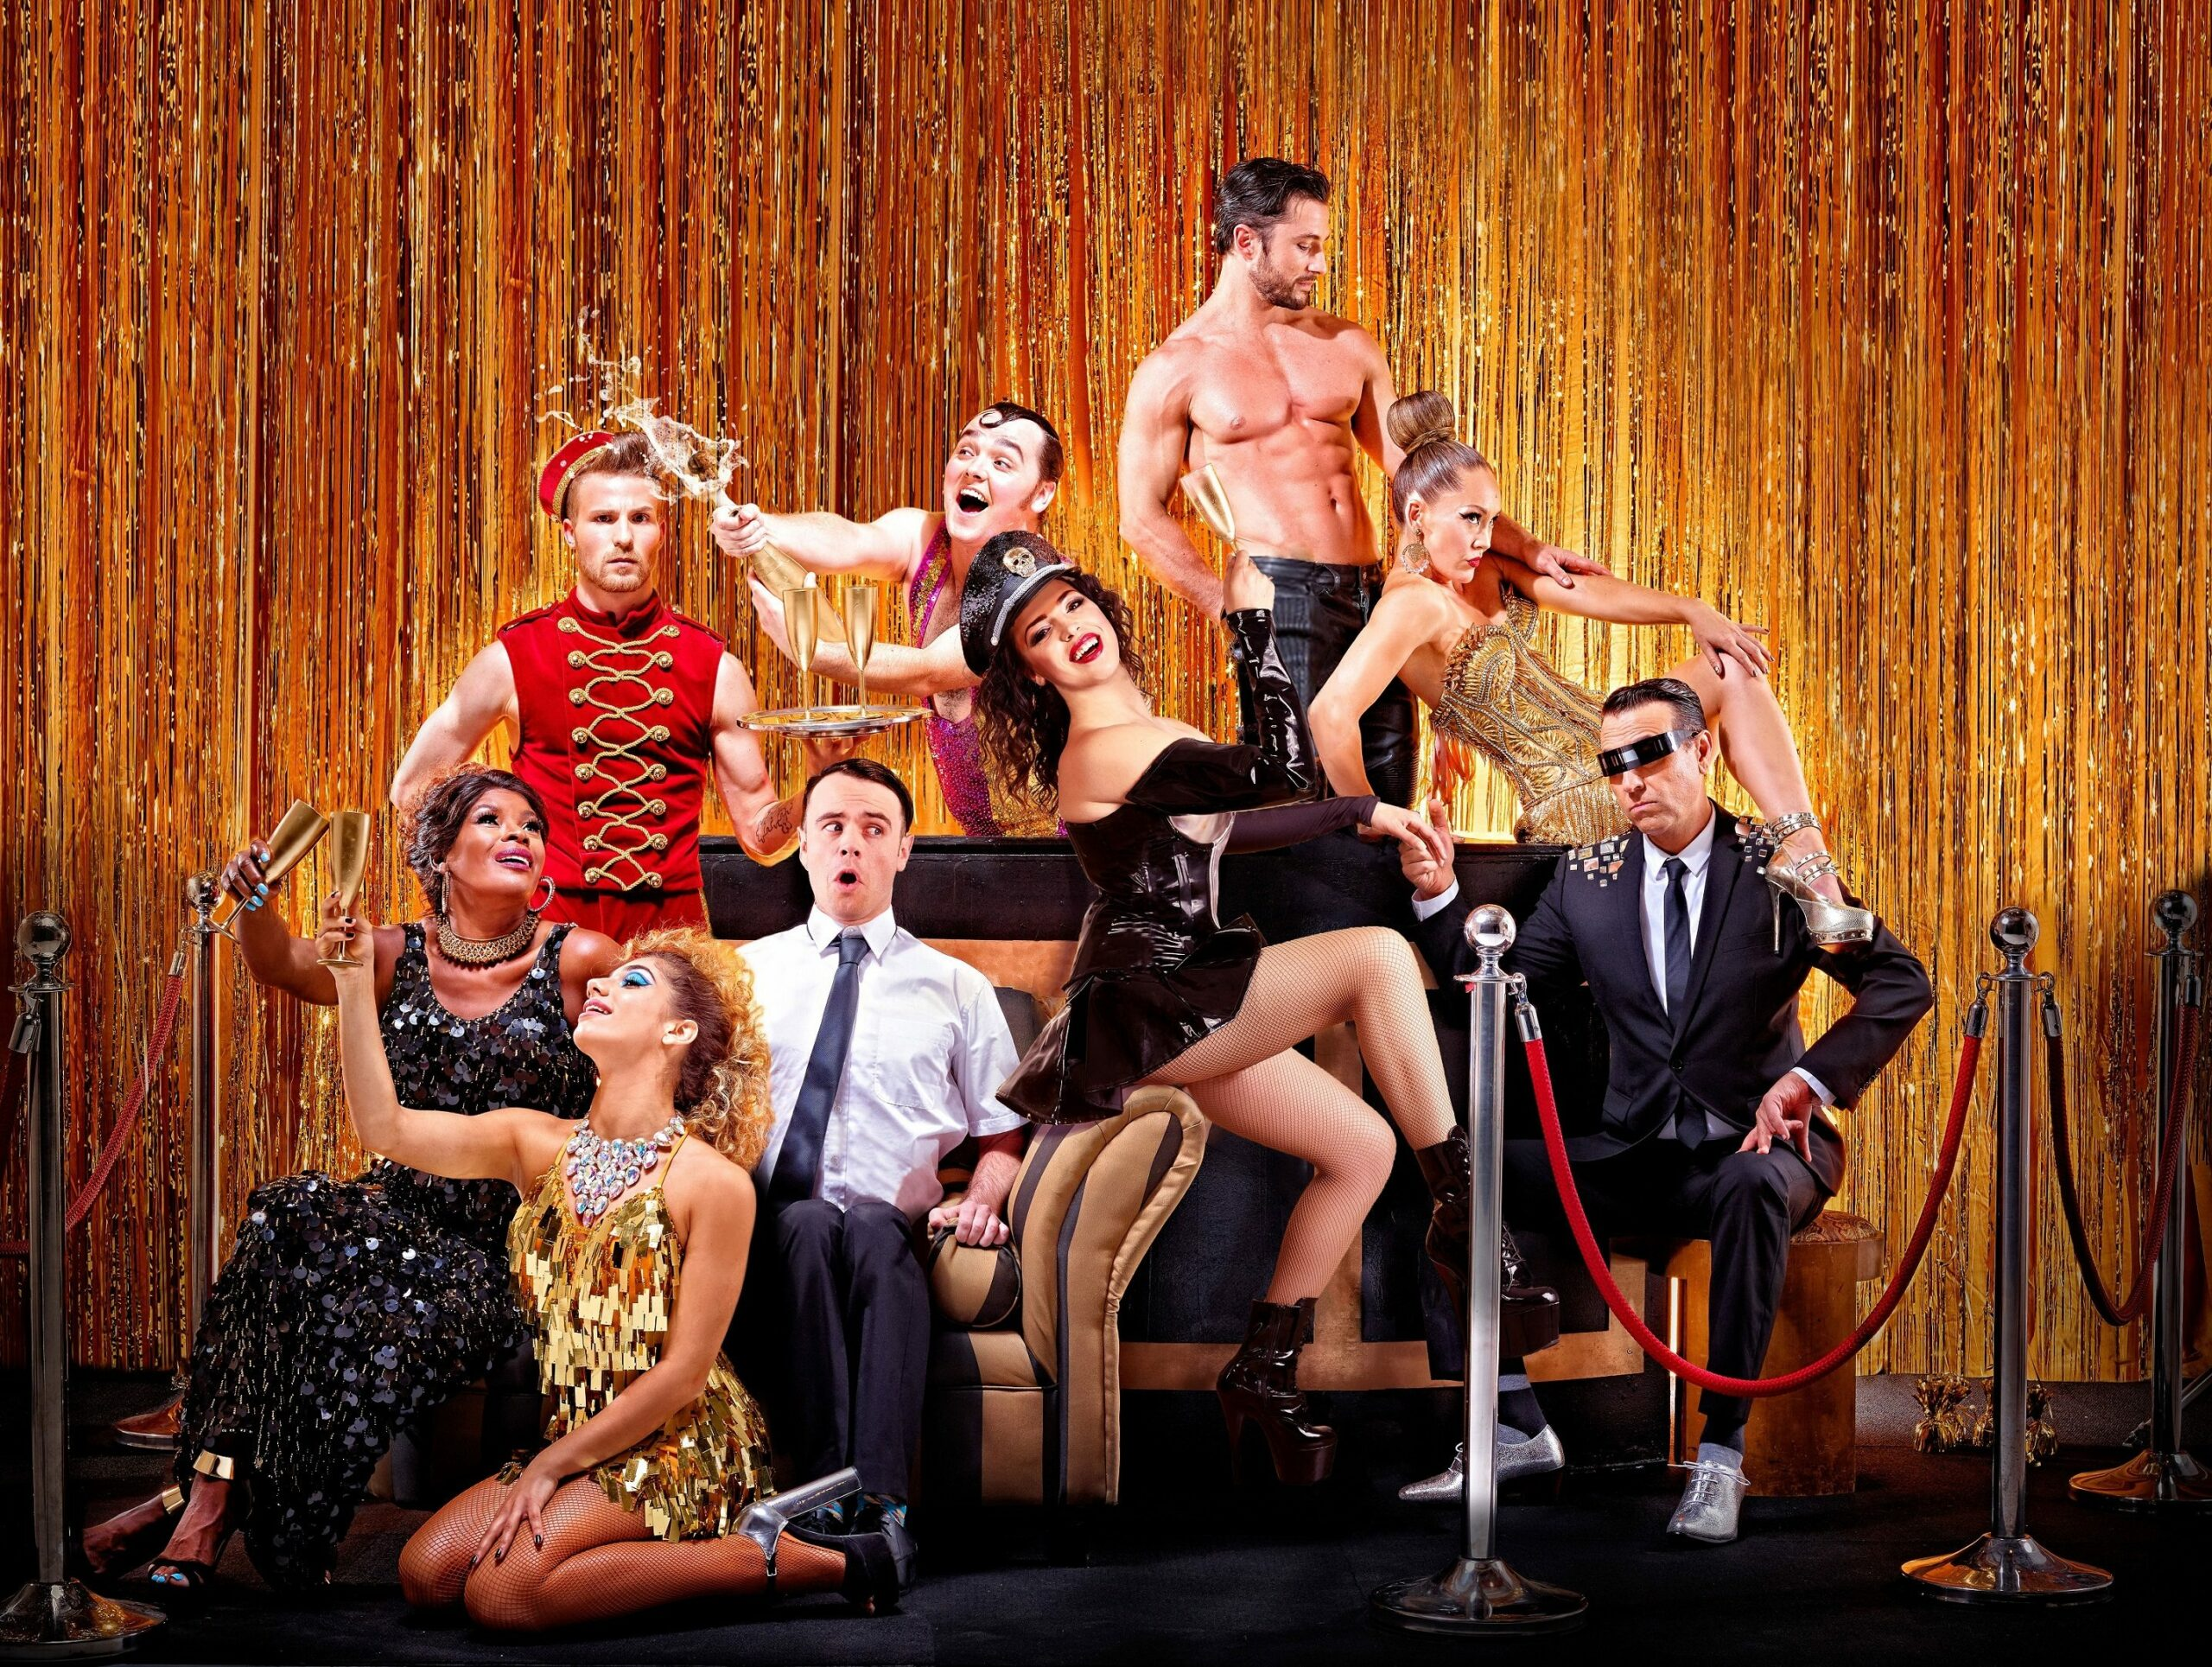 gay-express-velvet-cast-photo